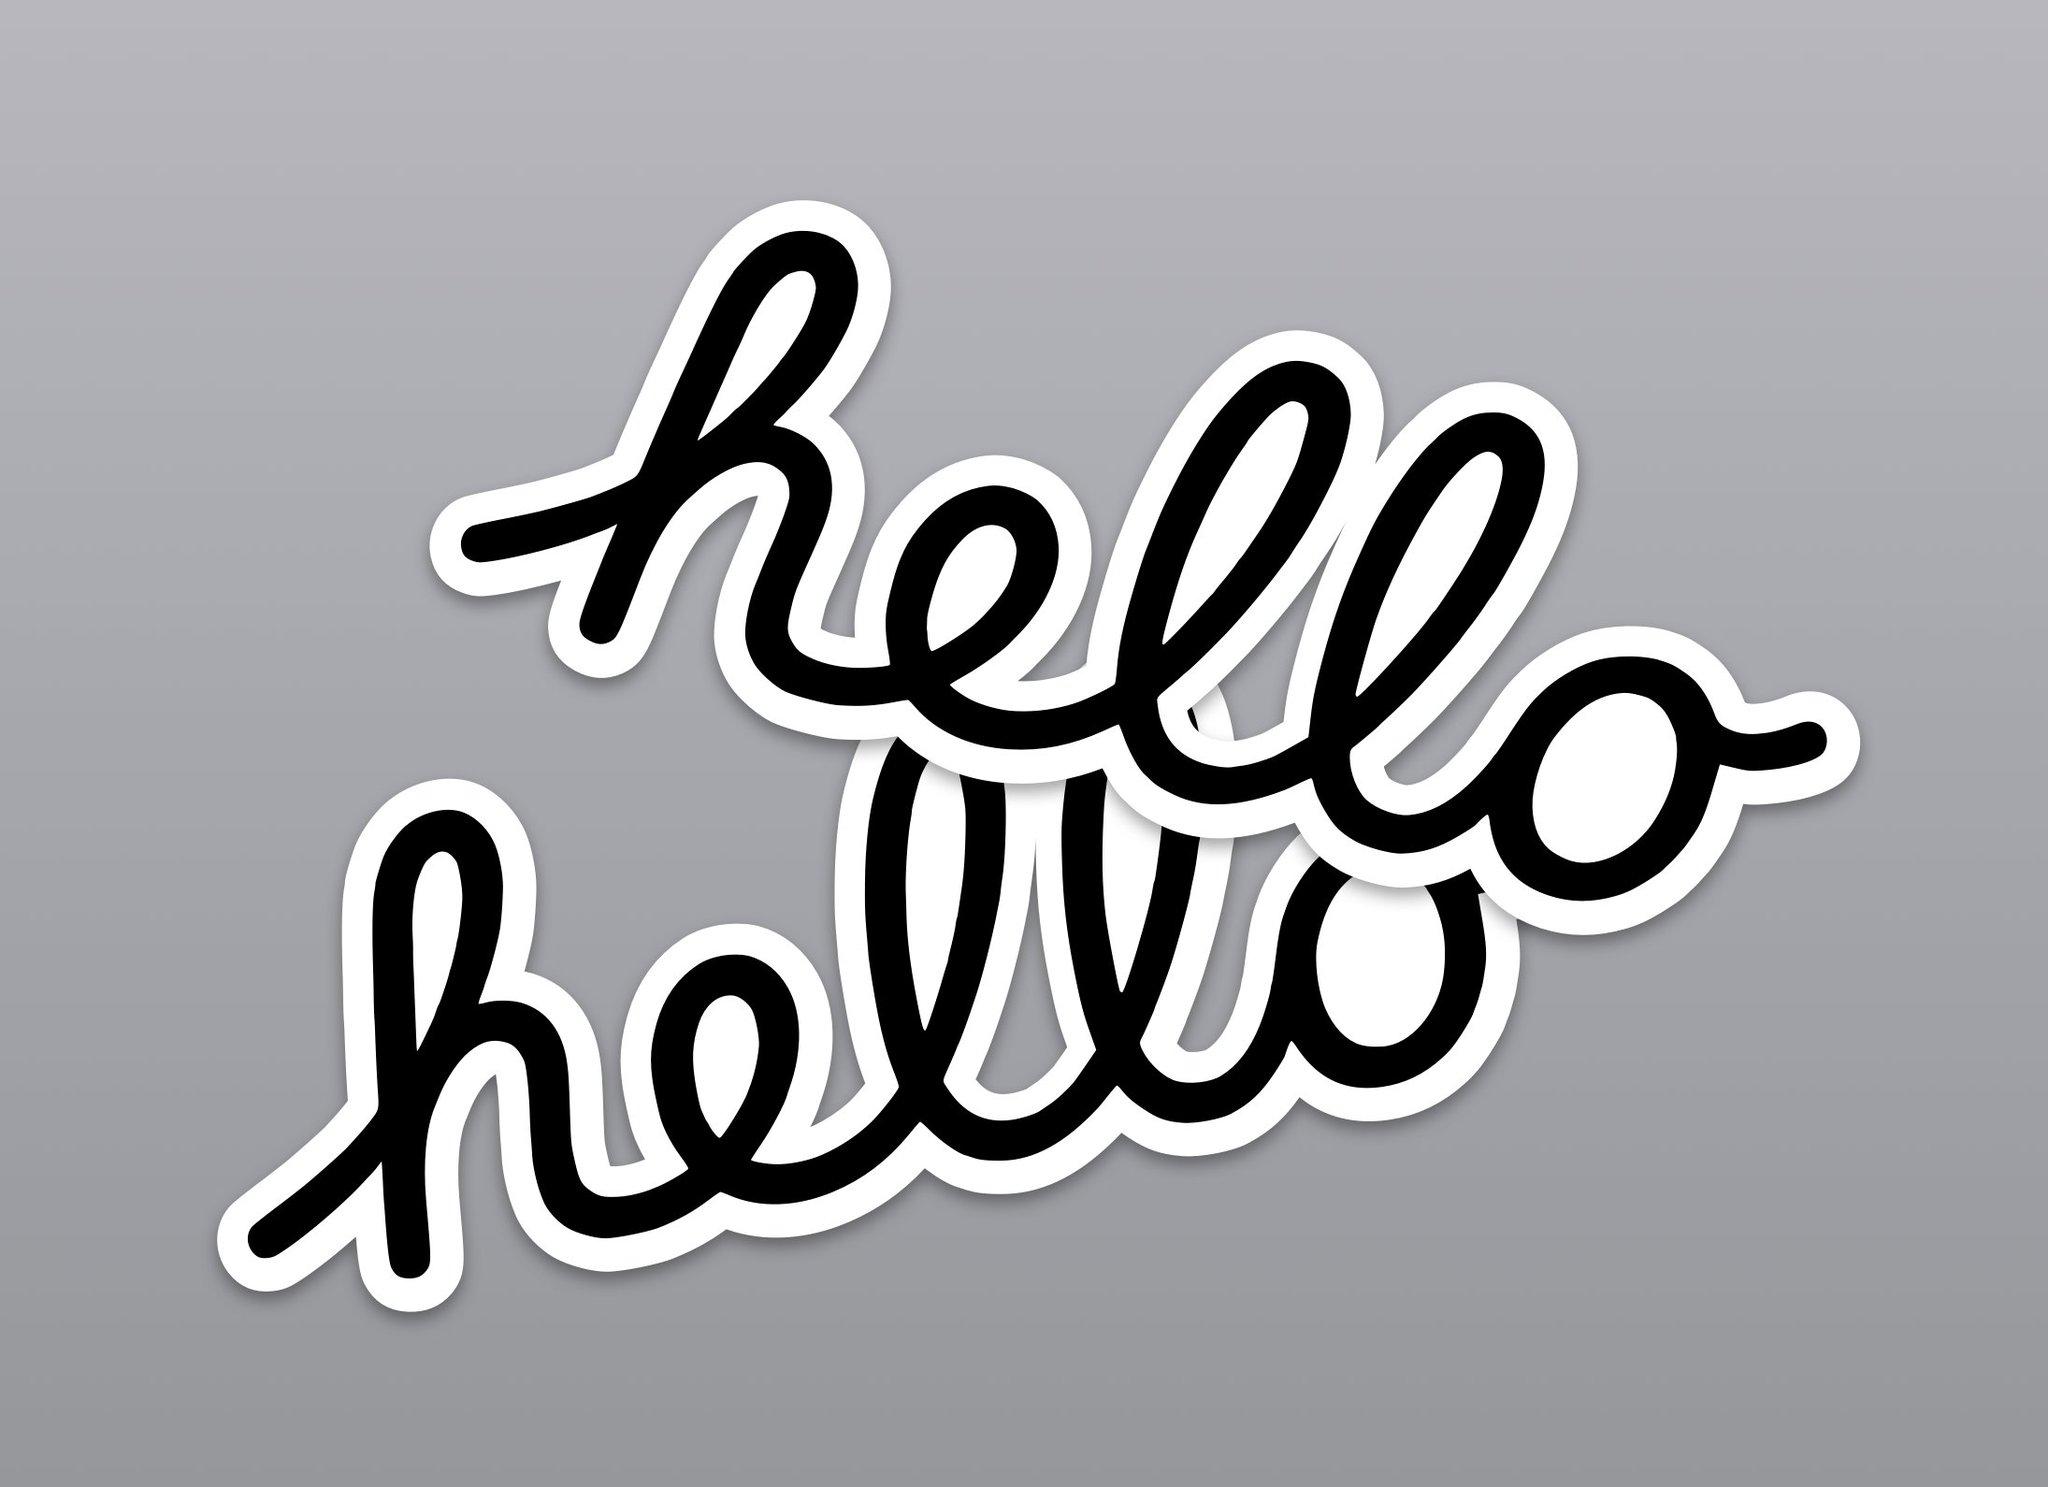 sticker wwdc 2020 wallpaper-ipad basvanderploeg idownloadblog hello